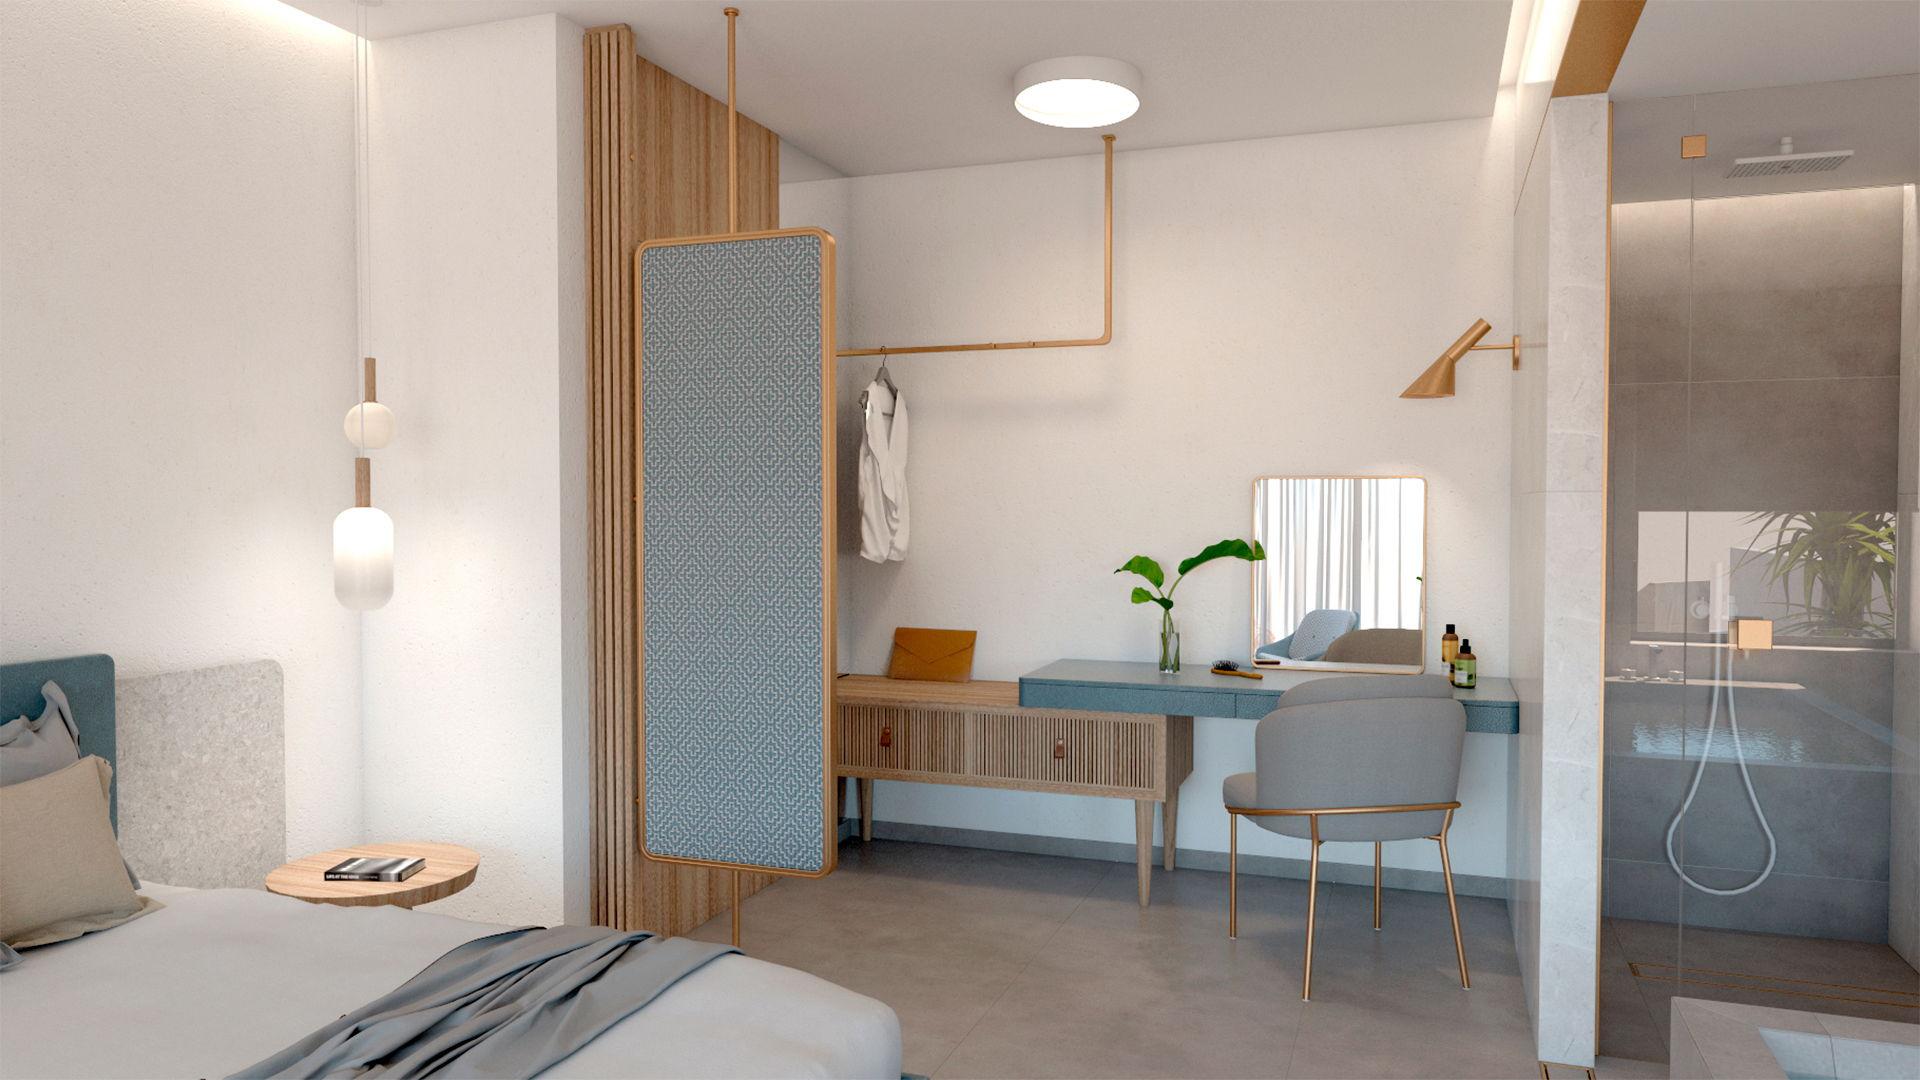 Luxury suite, interior design, wardrobe and dressing table. Πολυτελής σουίτα, σχεδιασμός και διακόσμηση, ντουλάπα και γραφείο.